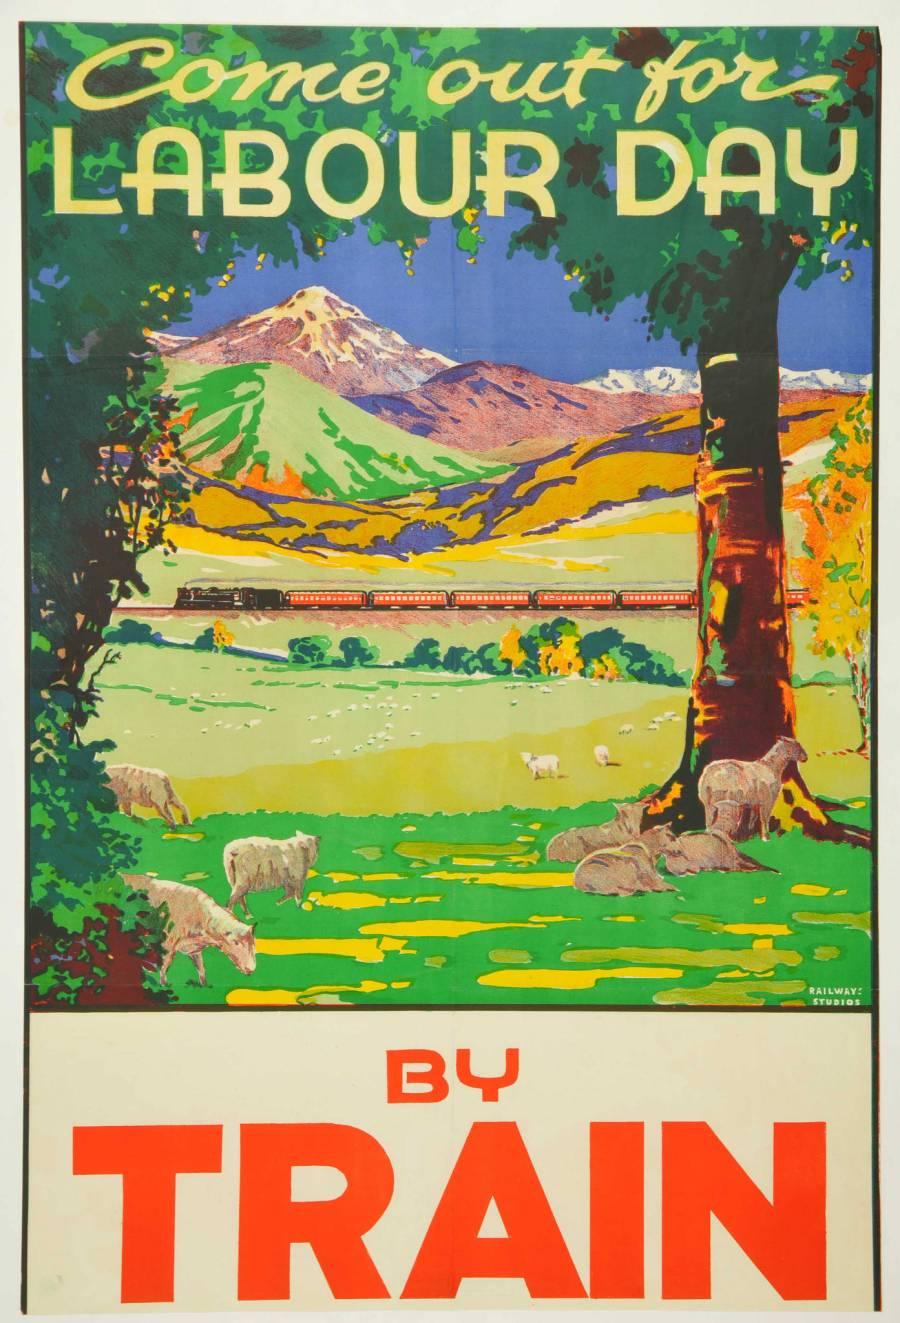 vintage poster, New Zealand, Labour Day, steam locomotive,